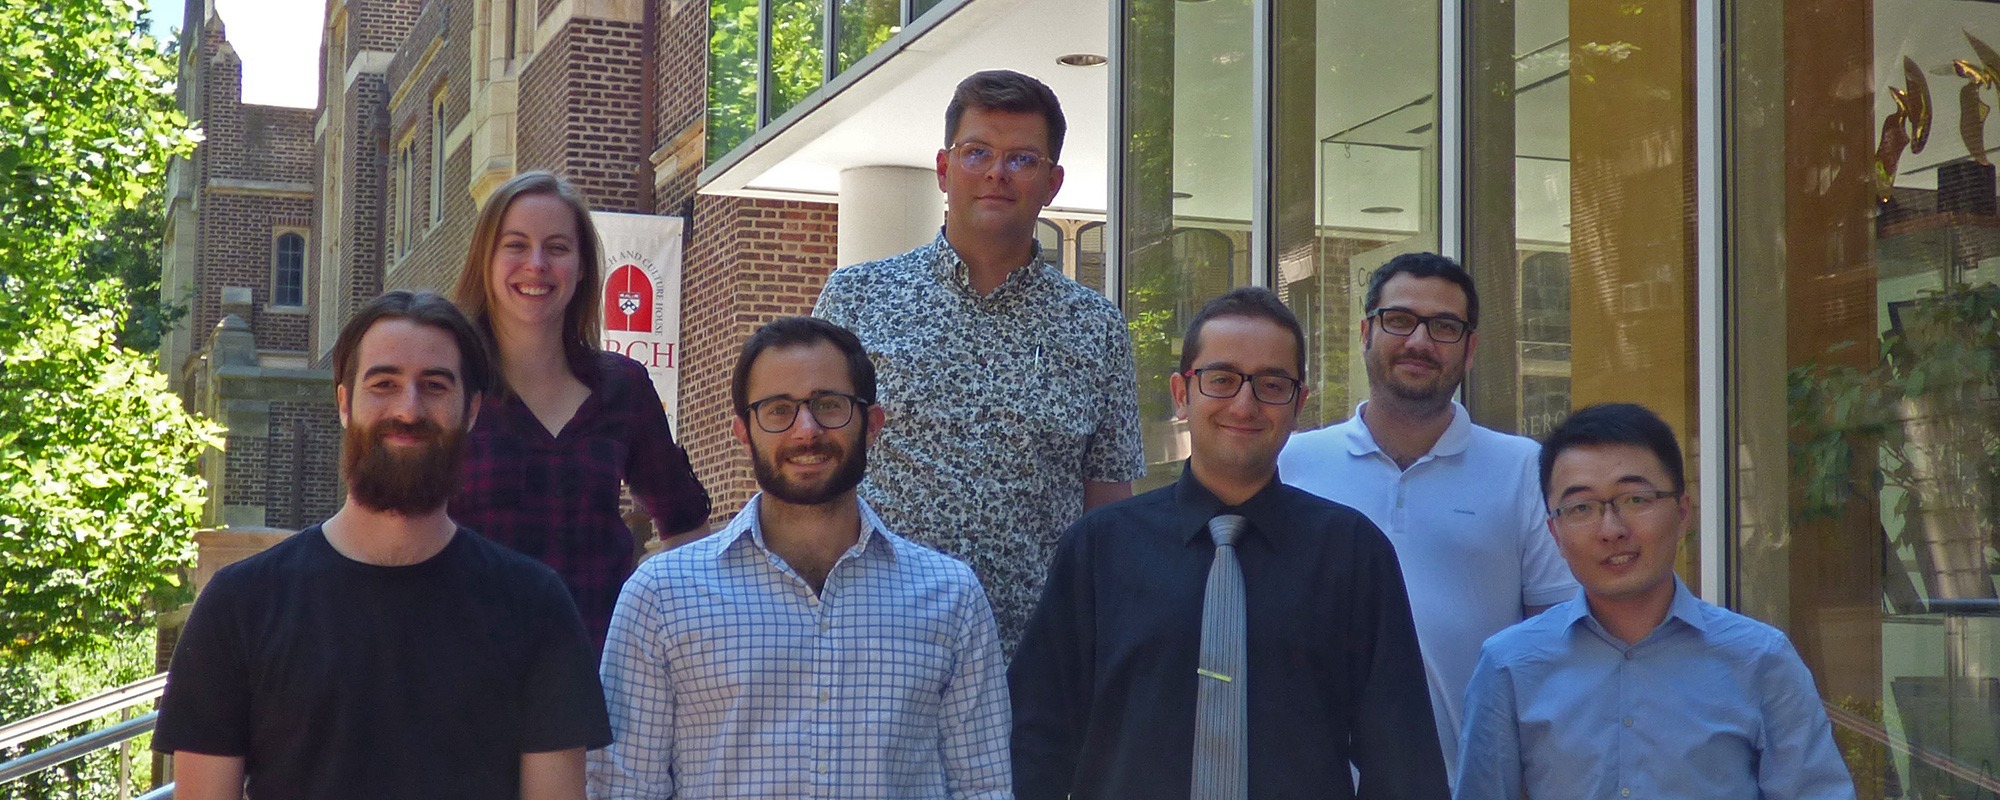 APPC's new postdoctoral fellows in the Science of Science Communicatinon are Daniel Chapman, Kathryn Haglin, Matt Motta, Dominik Stecula, Ozan Kuru, Yotam Ophir, and Hang Lu.